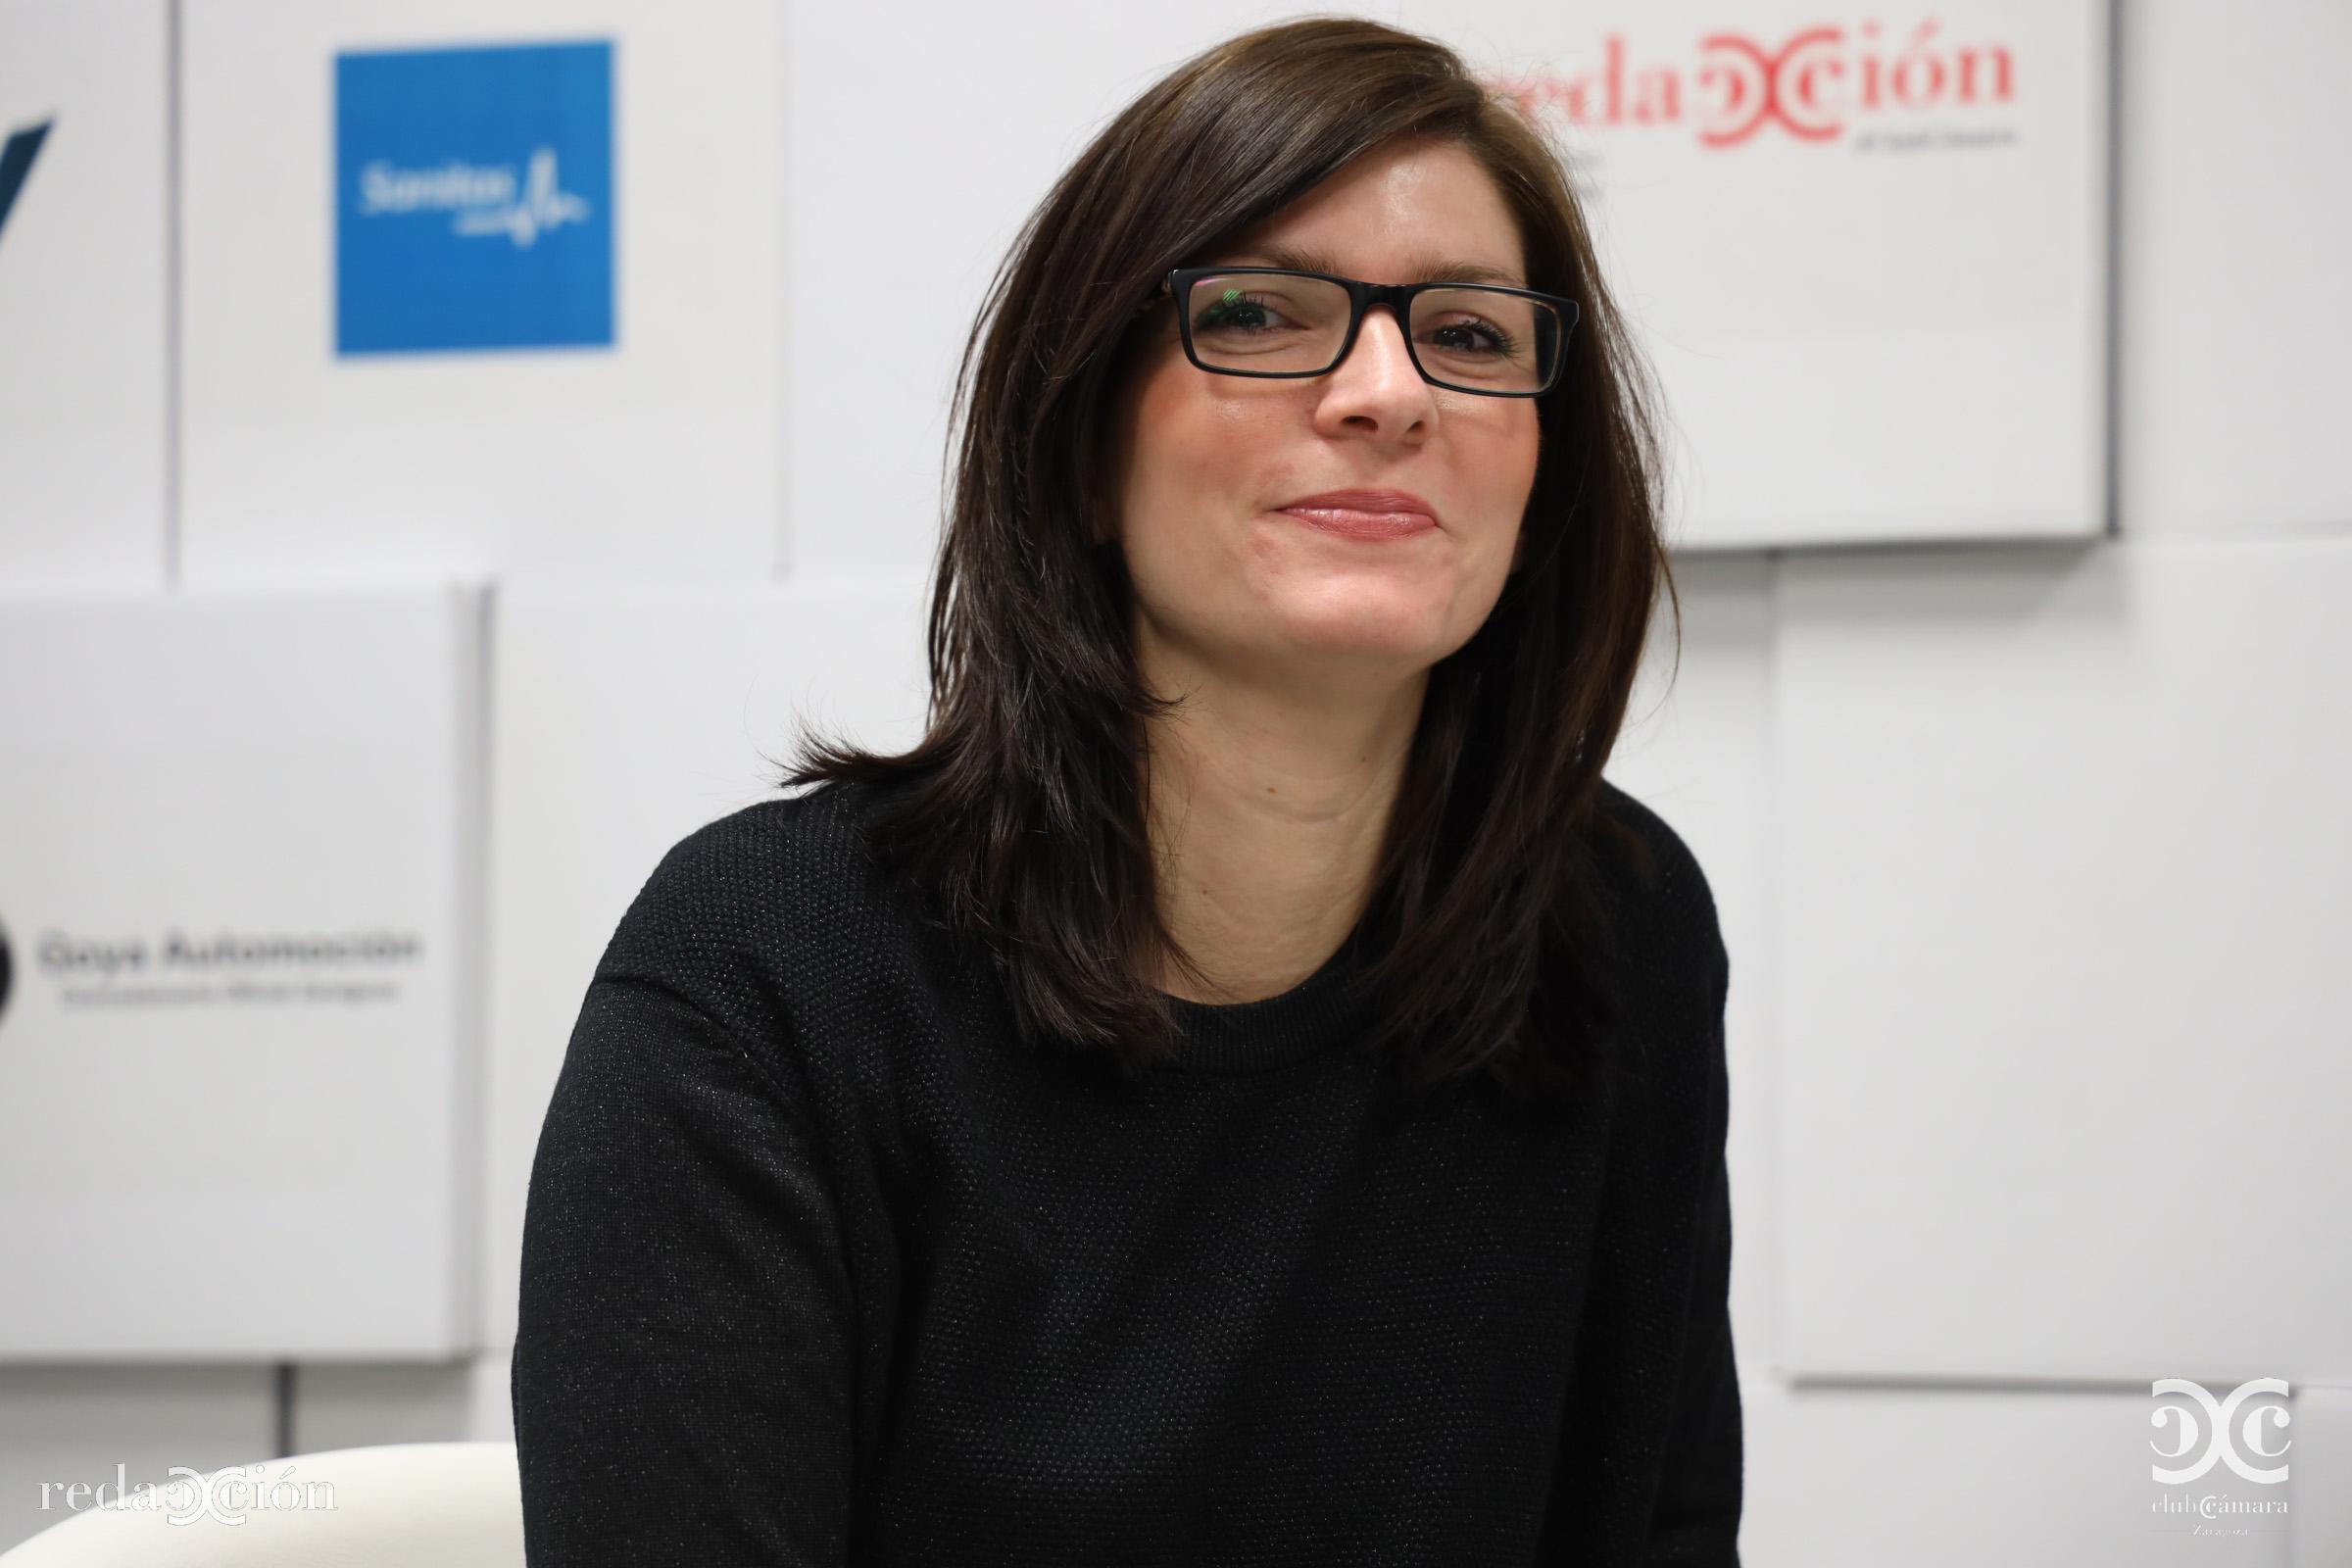 Anne Lise Ghirardi